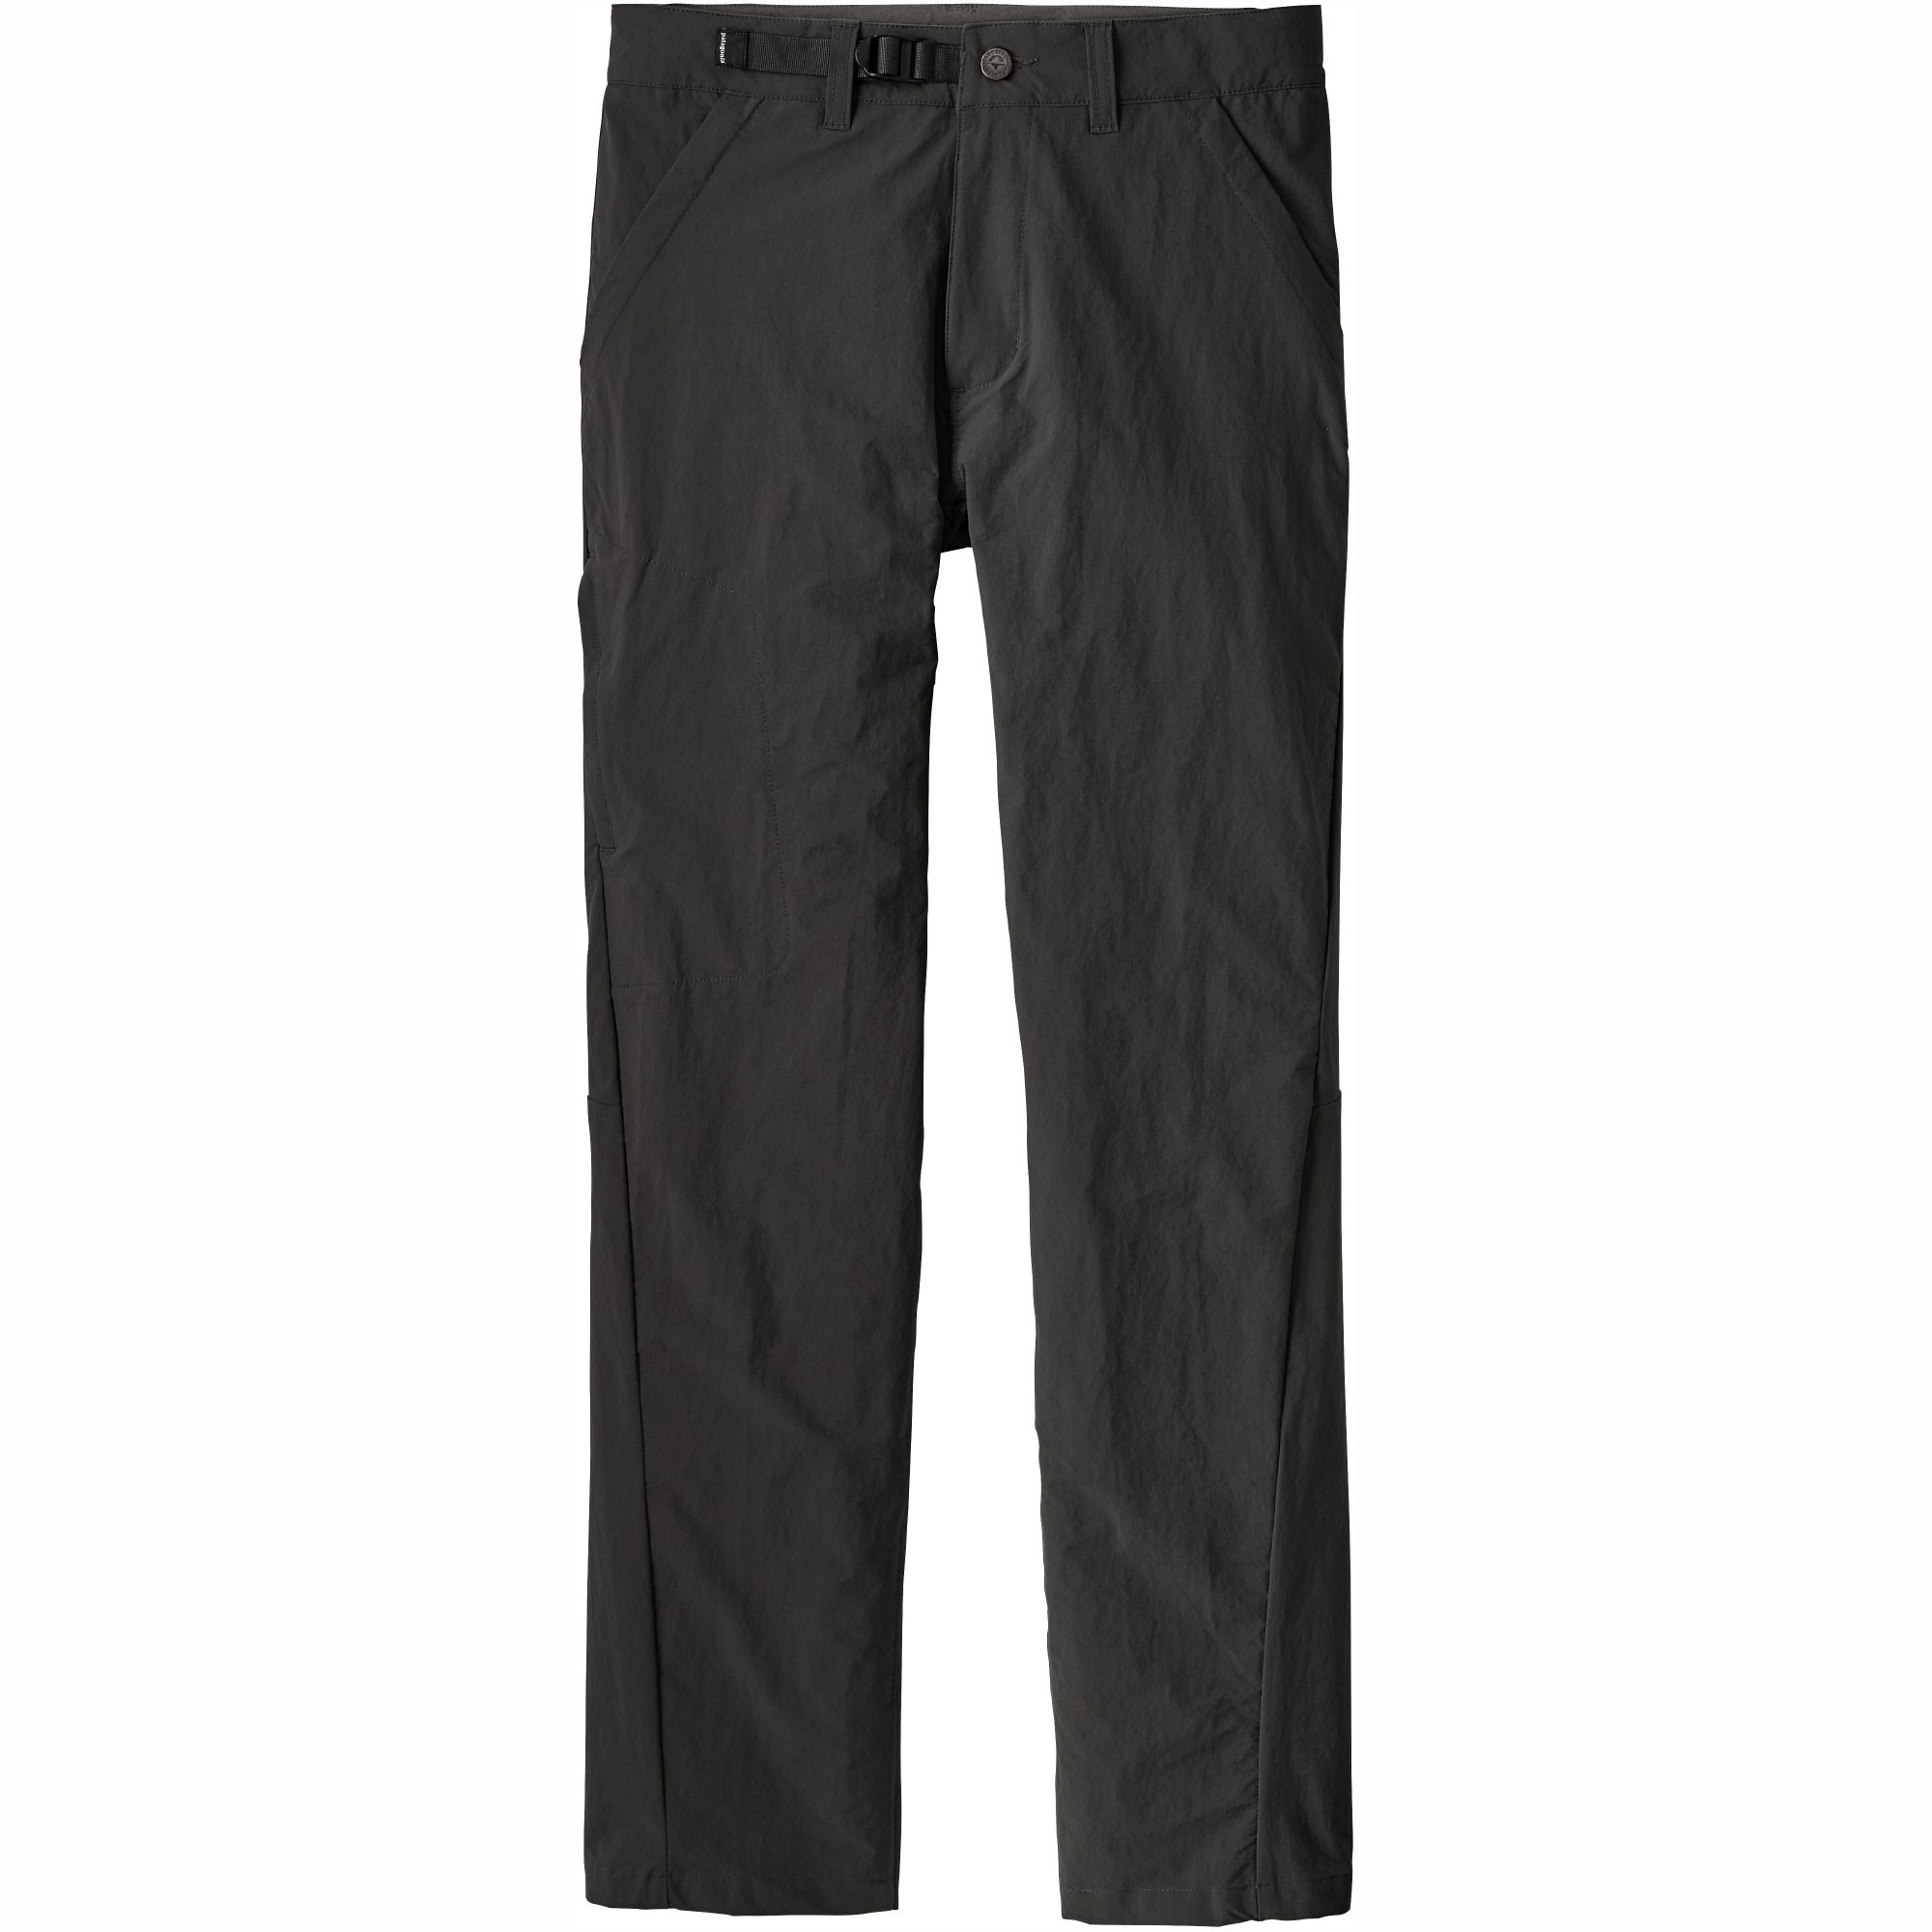 Patagonia Stonycroft Pants Black S18